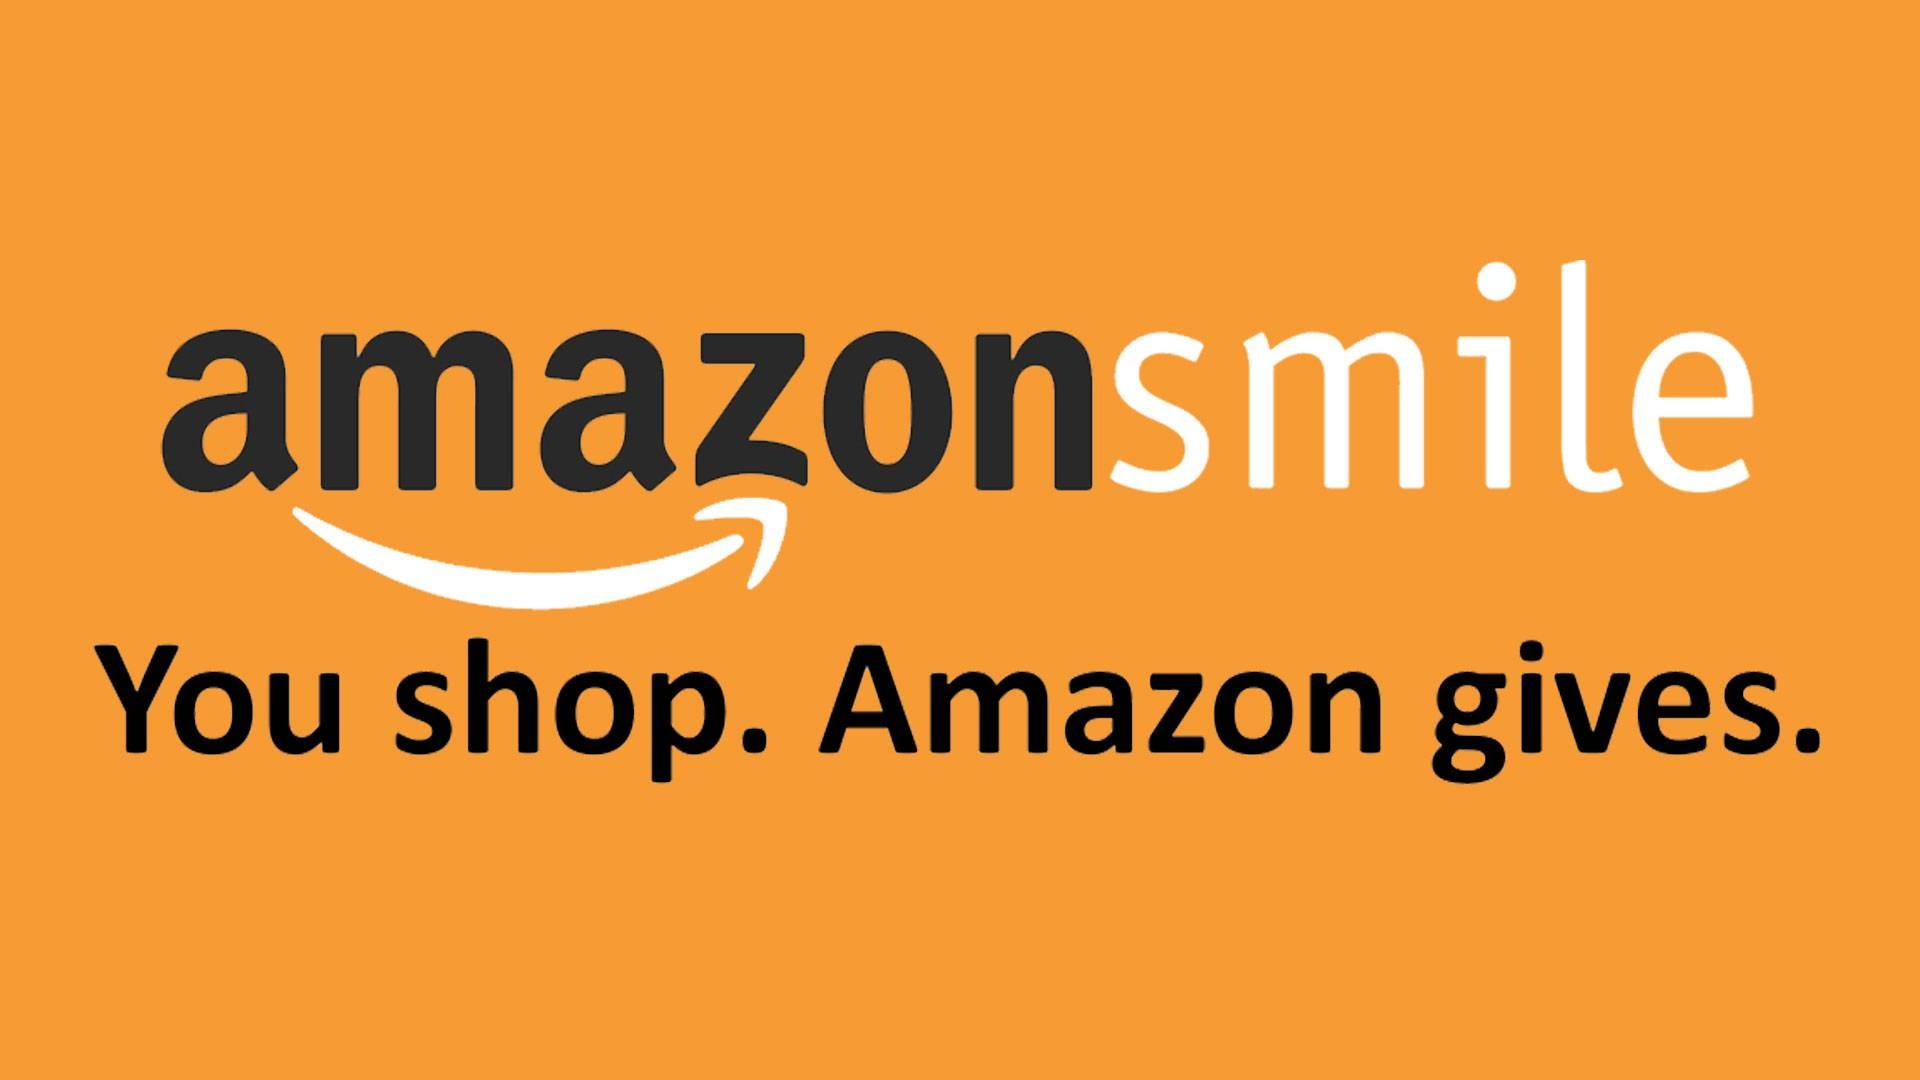 Amazon smile. You shop, amazon gives.